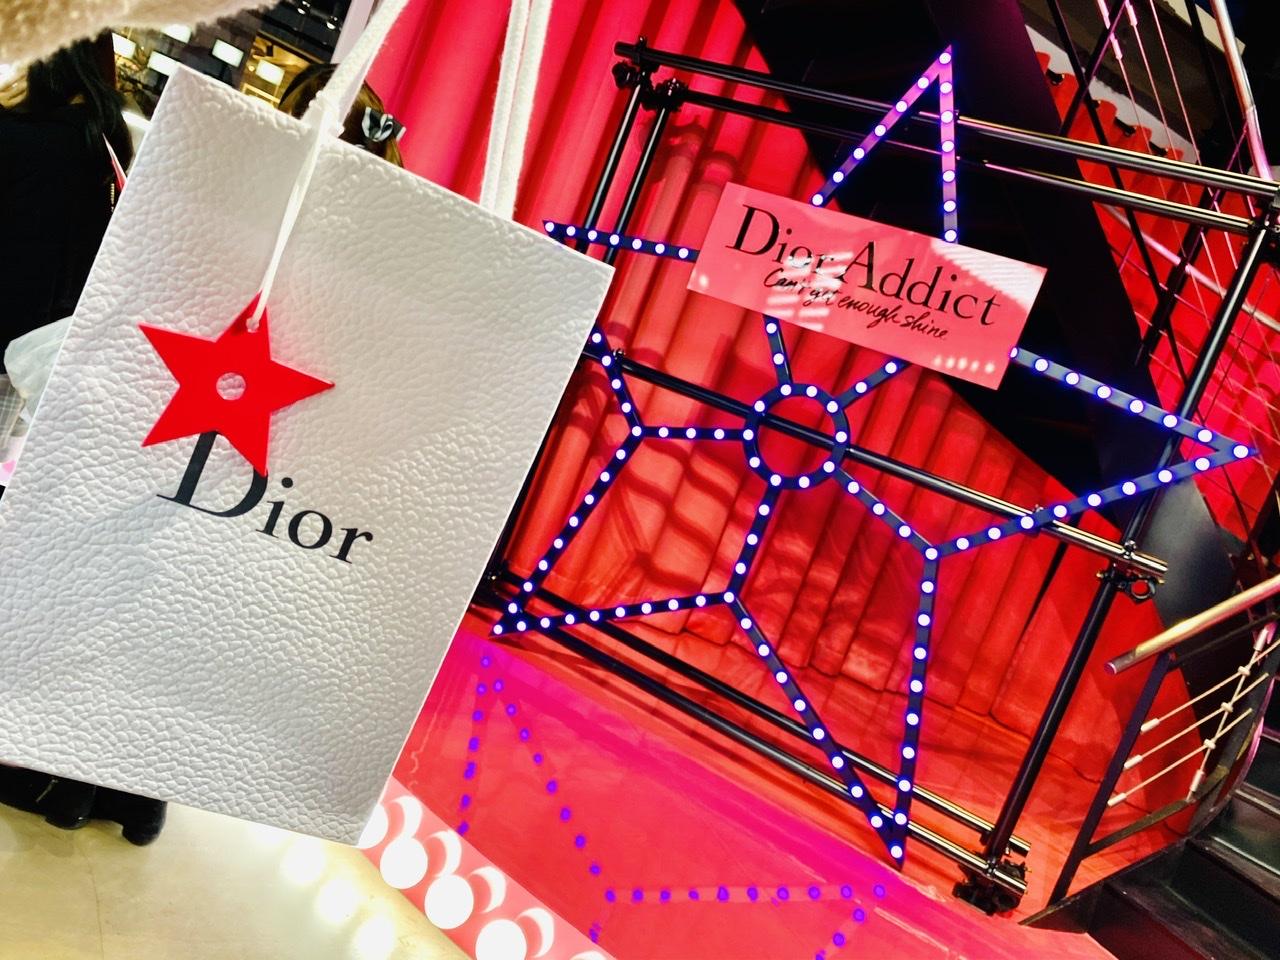 【Dior】豪華お土産付★新作リップをひと足早くお試し!連日大盛況のポップアップイベントへ♡_9